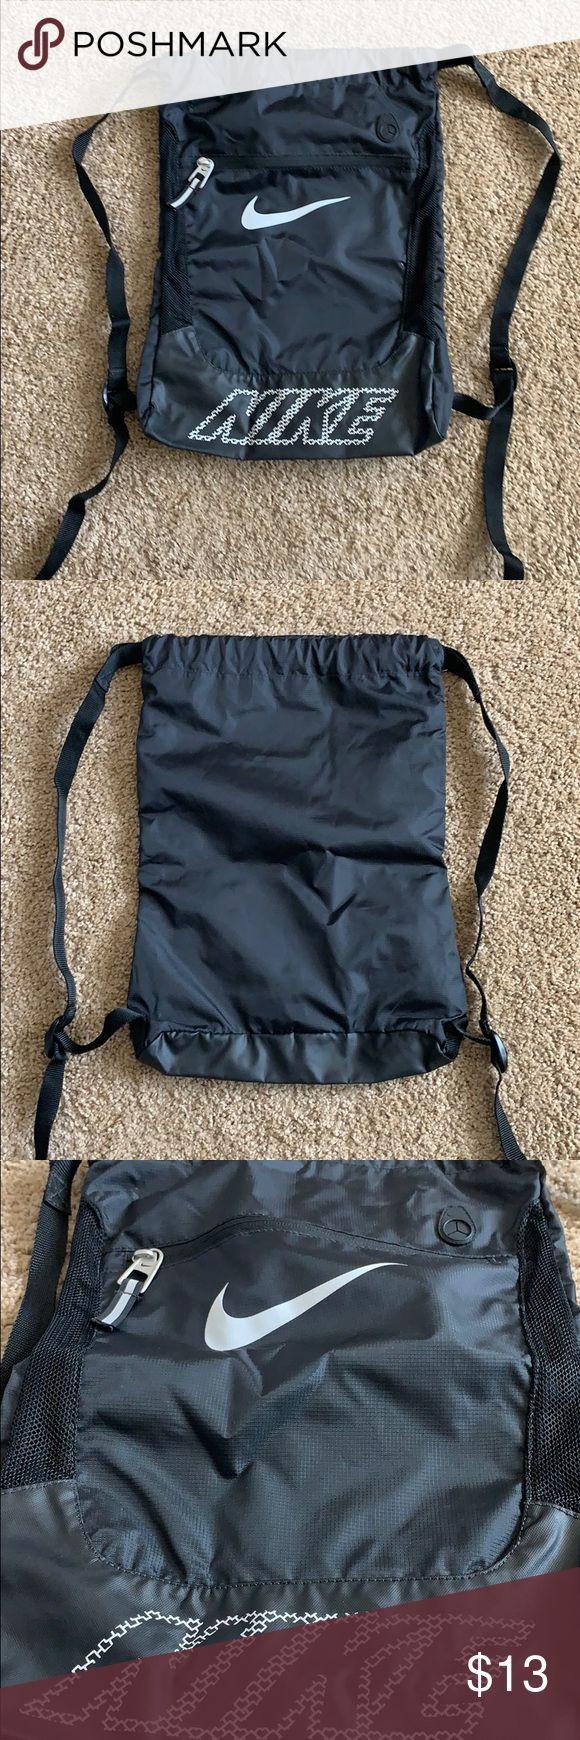 Nike Satchel Nike Satchel  • NWOT • Double inner Pouch • Front Zipper Pock…